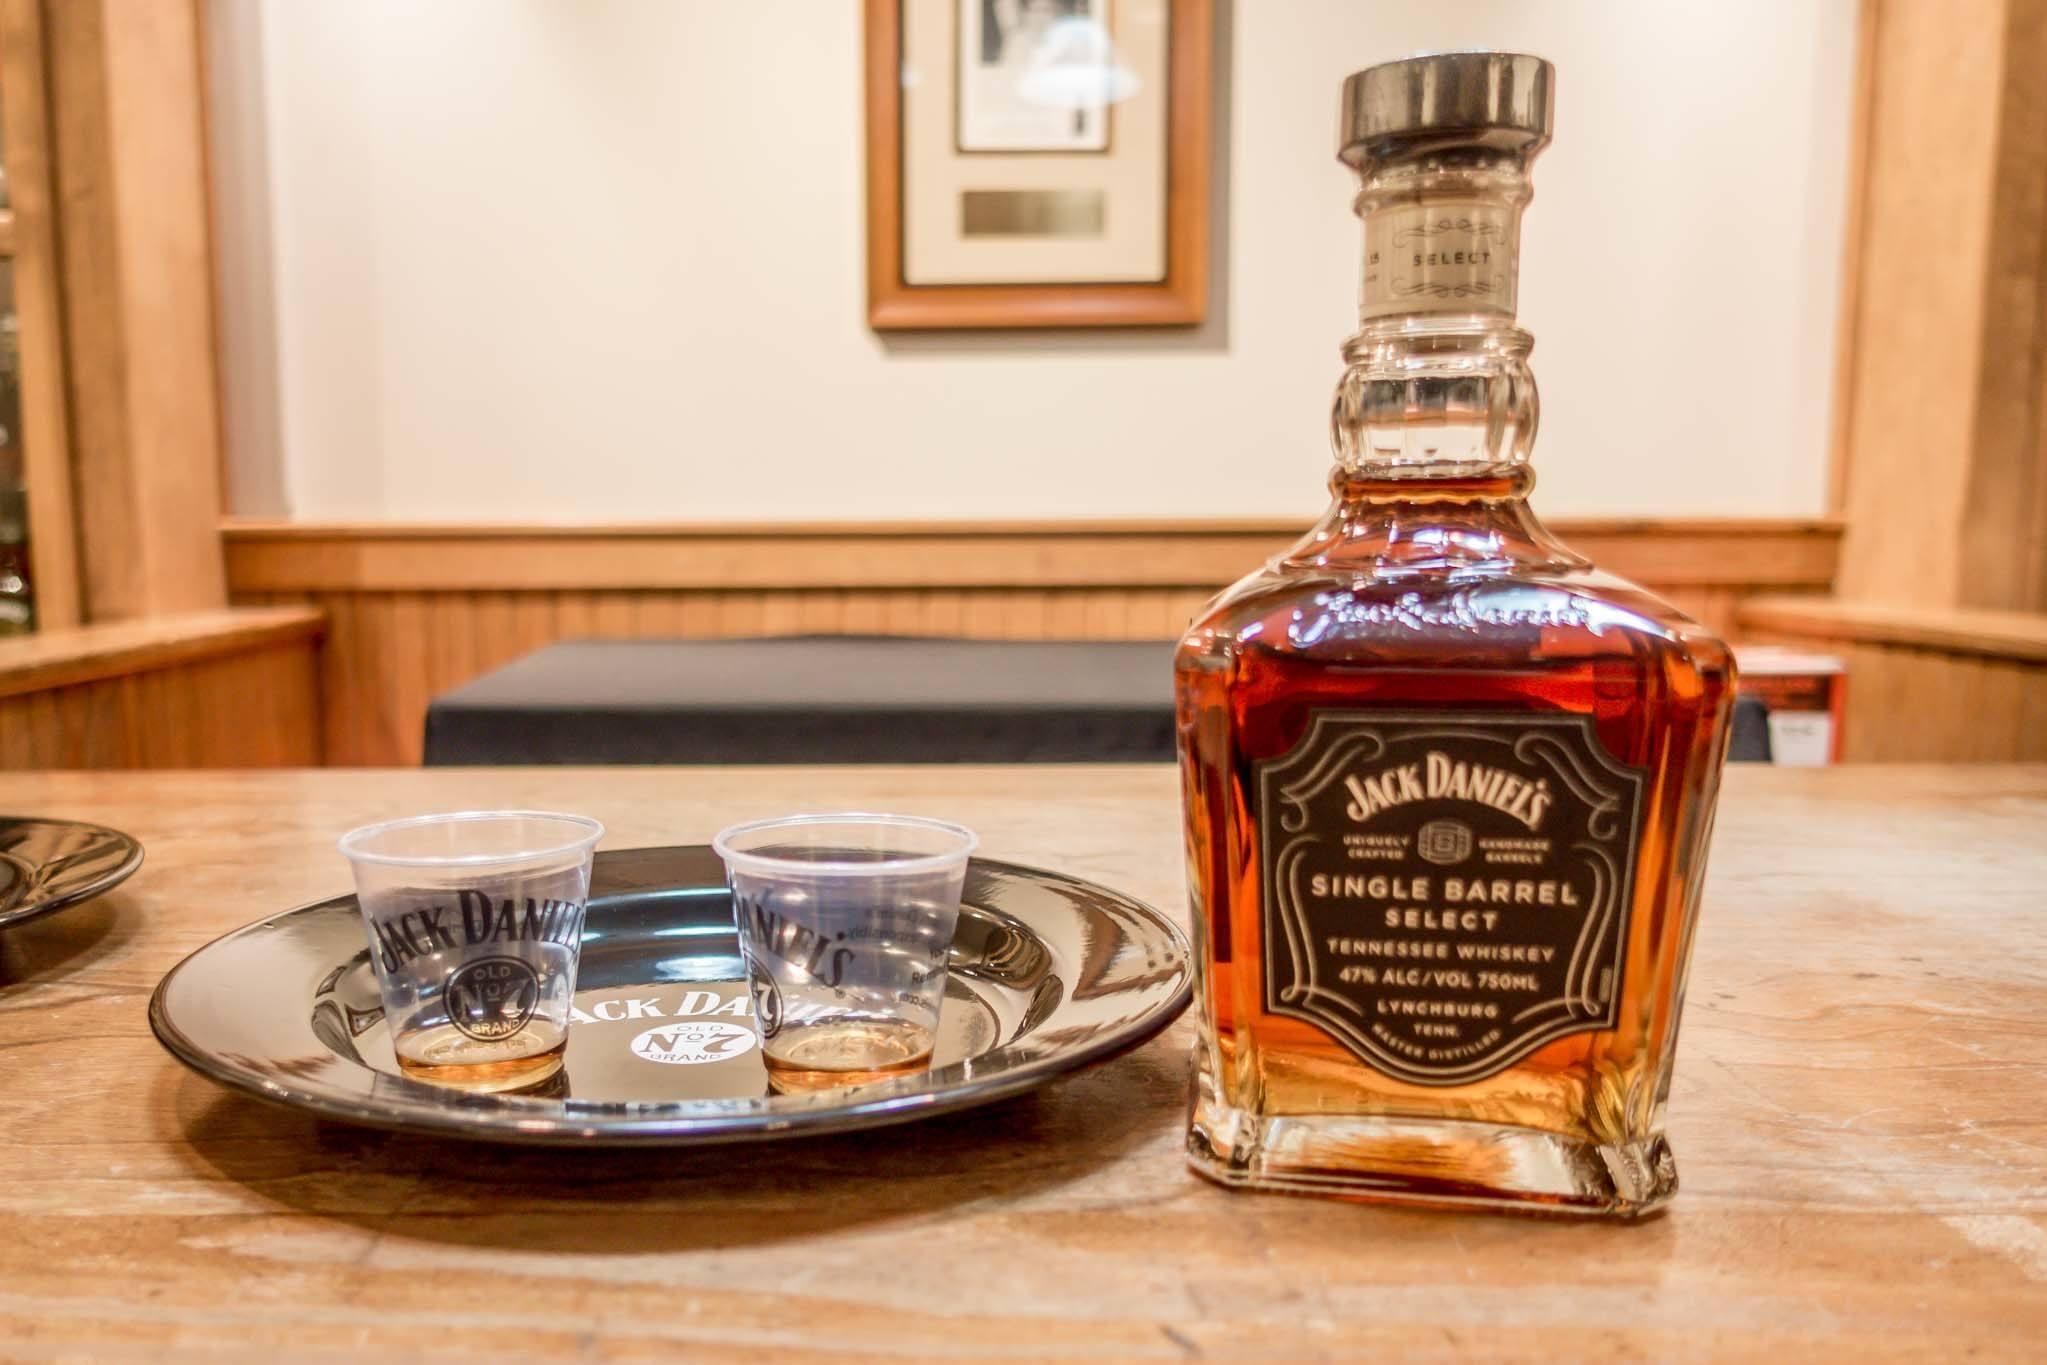 Jack Daniel's Single Barrel whiskey bottle and samples